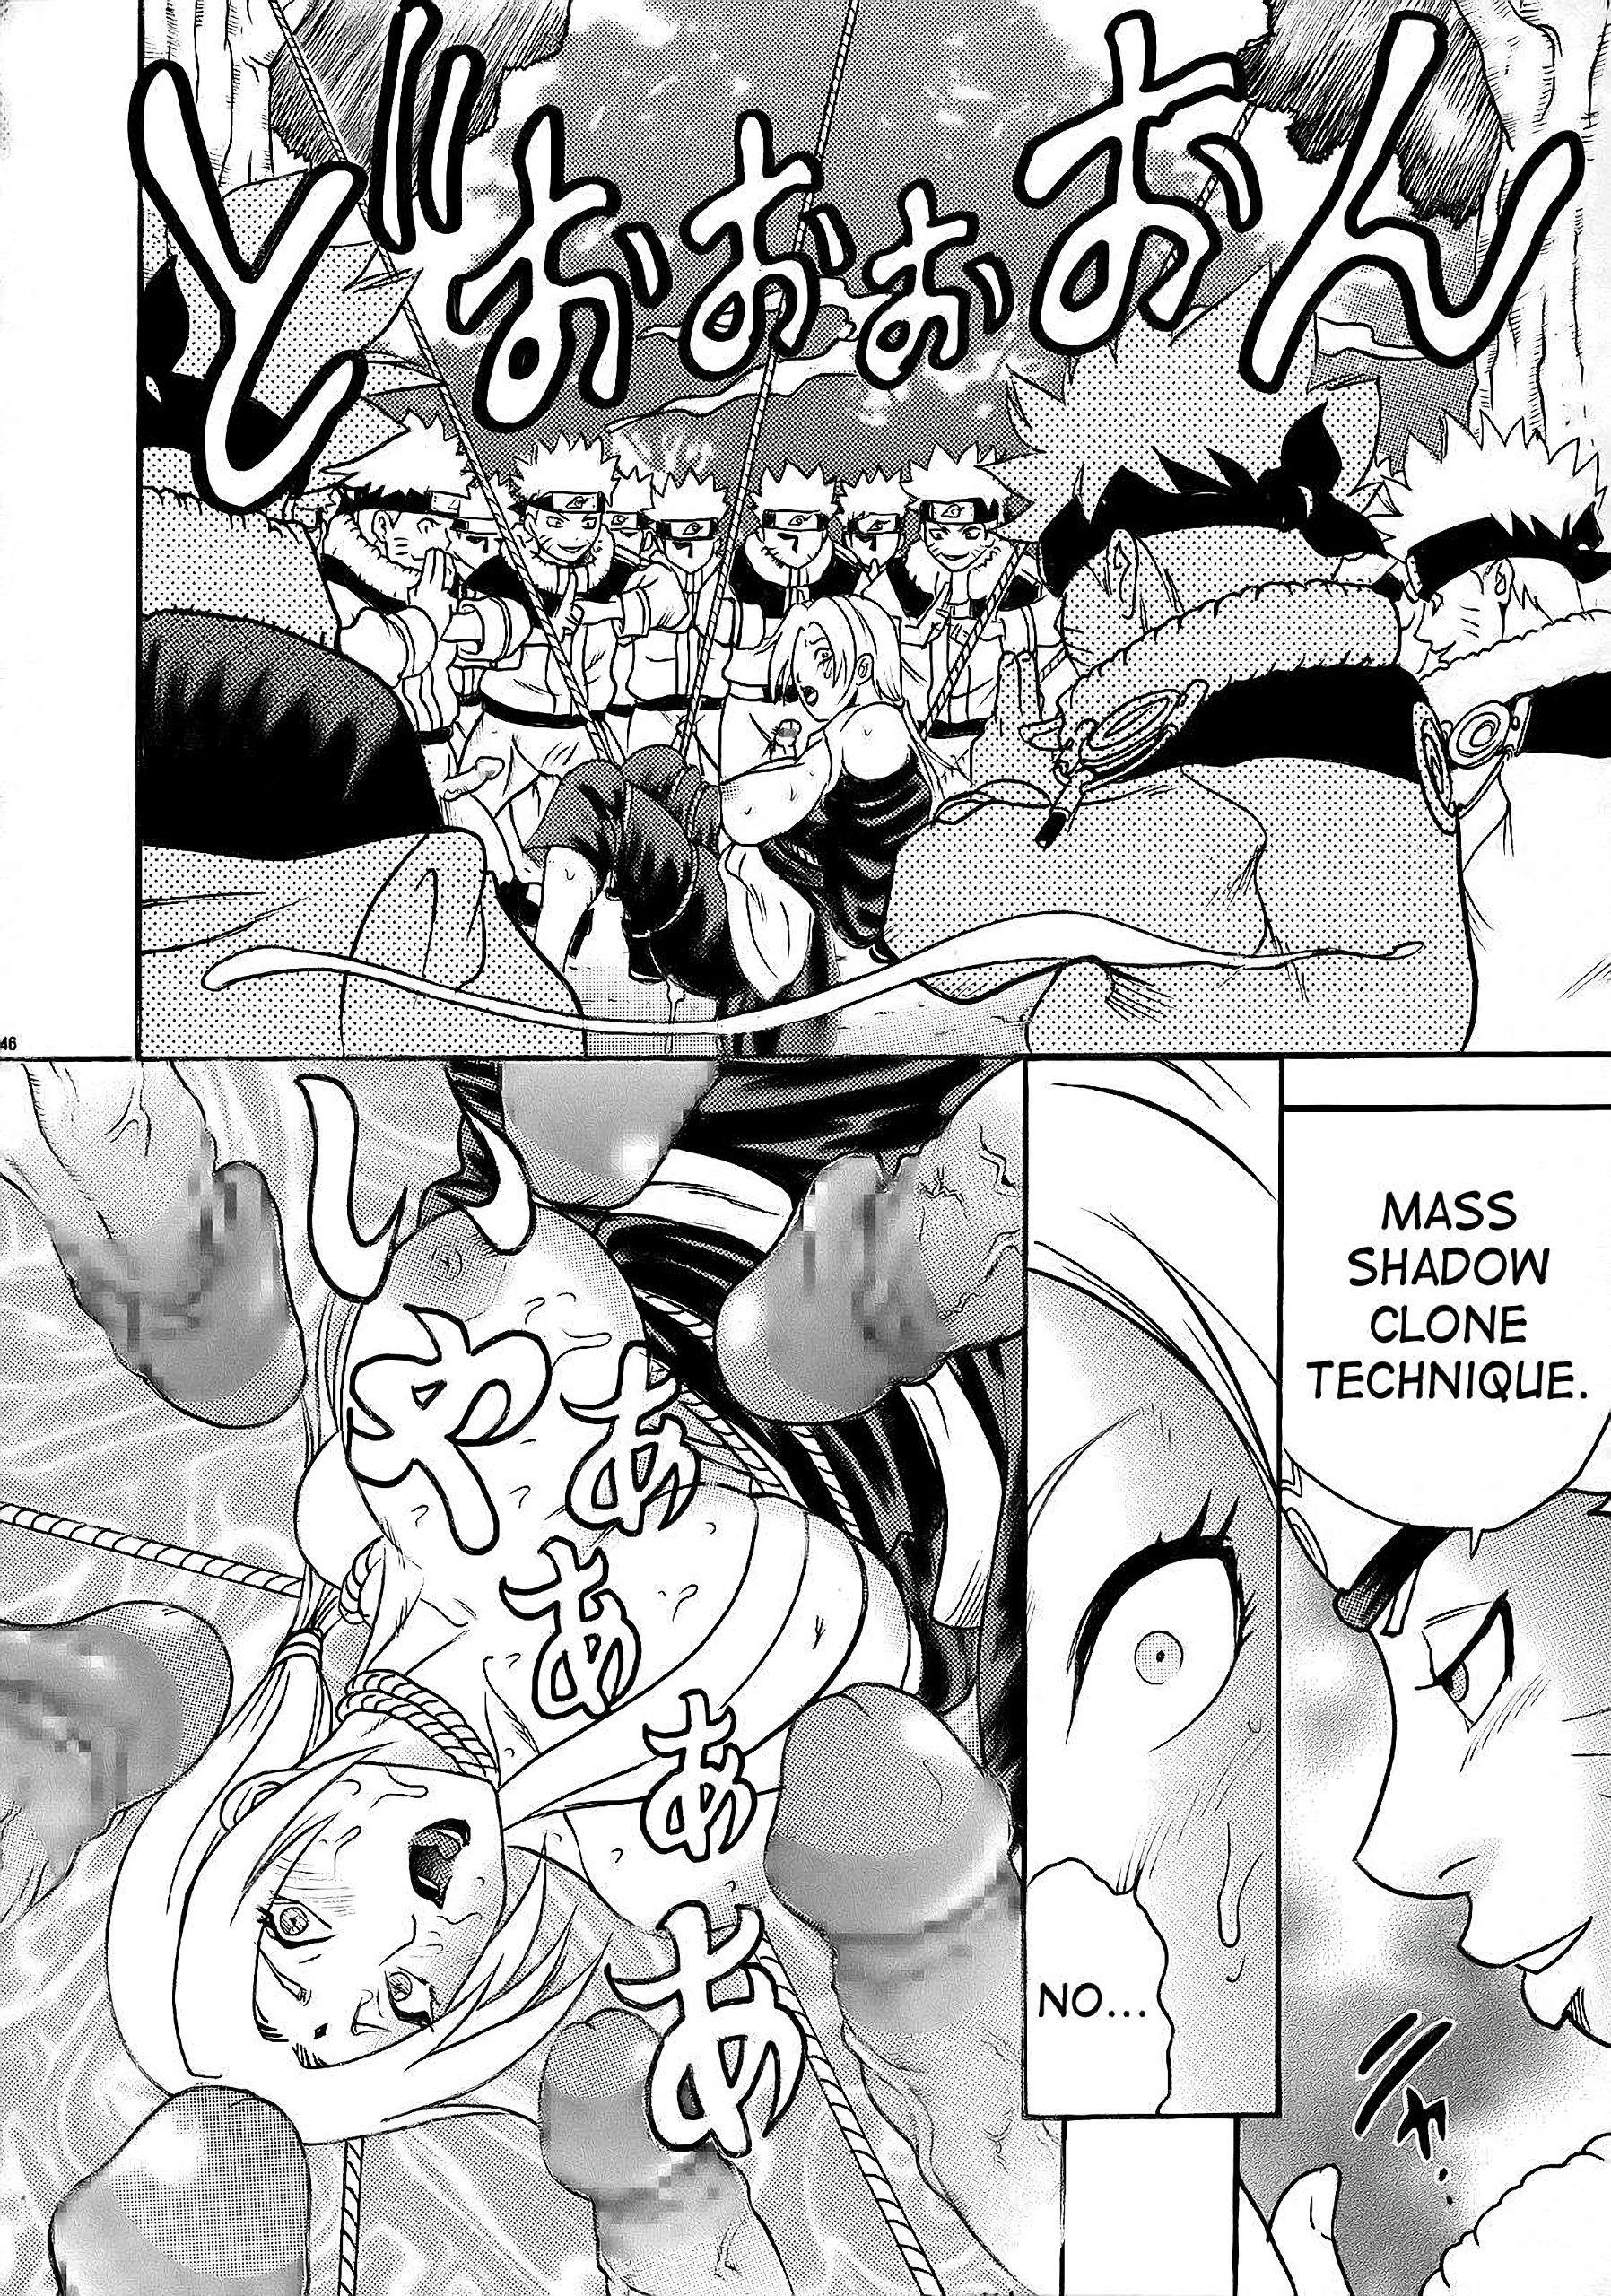 Pm 10 indecent ninja training hentai manga picture 42